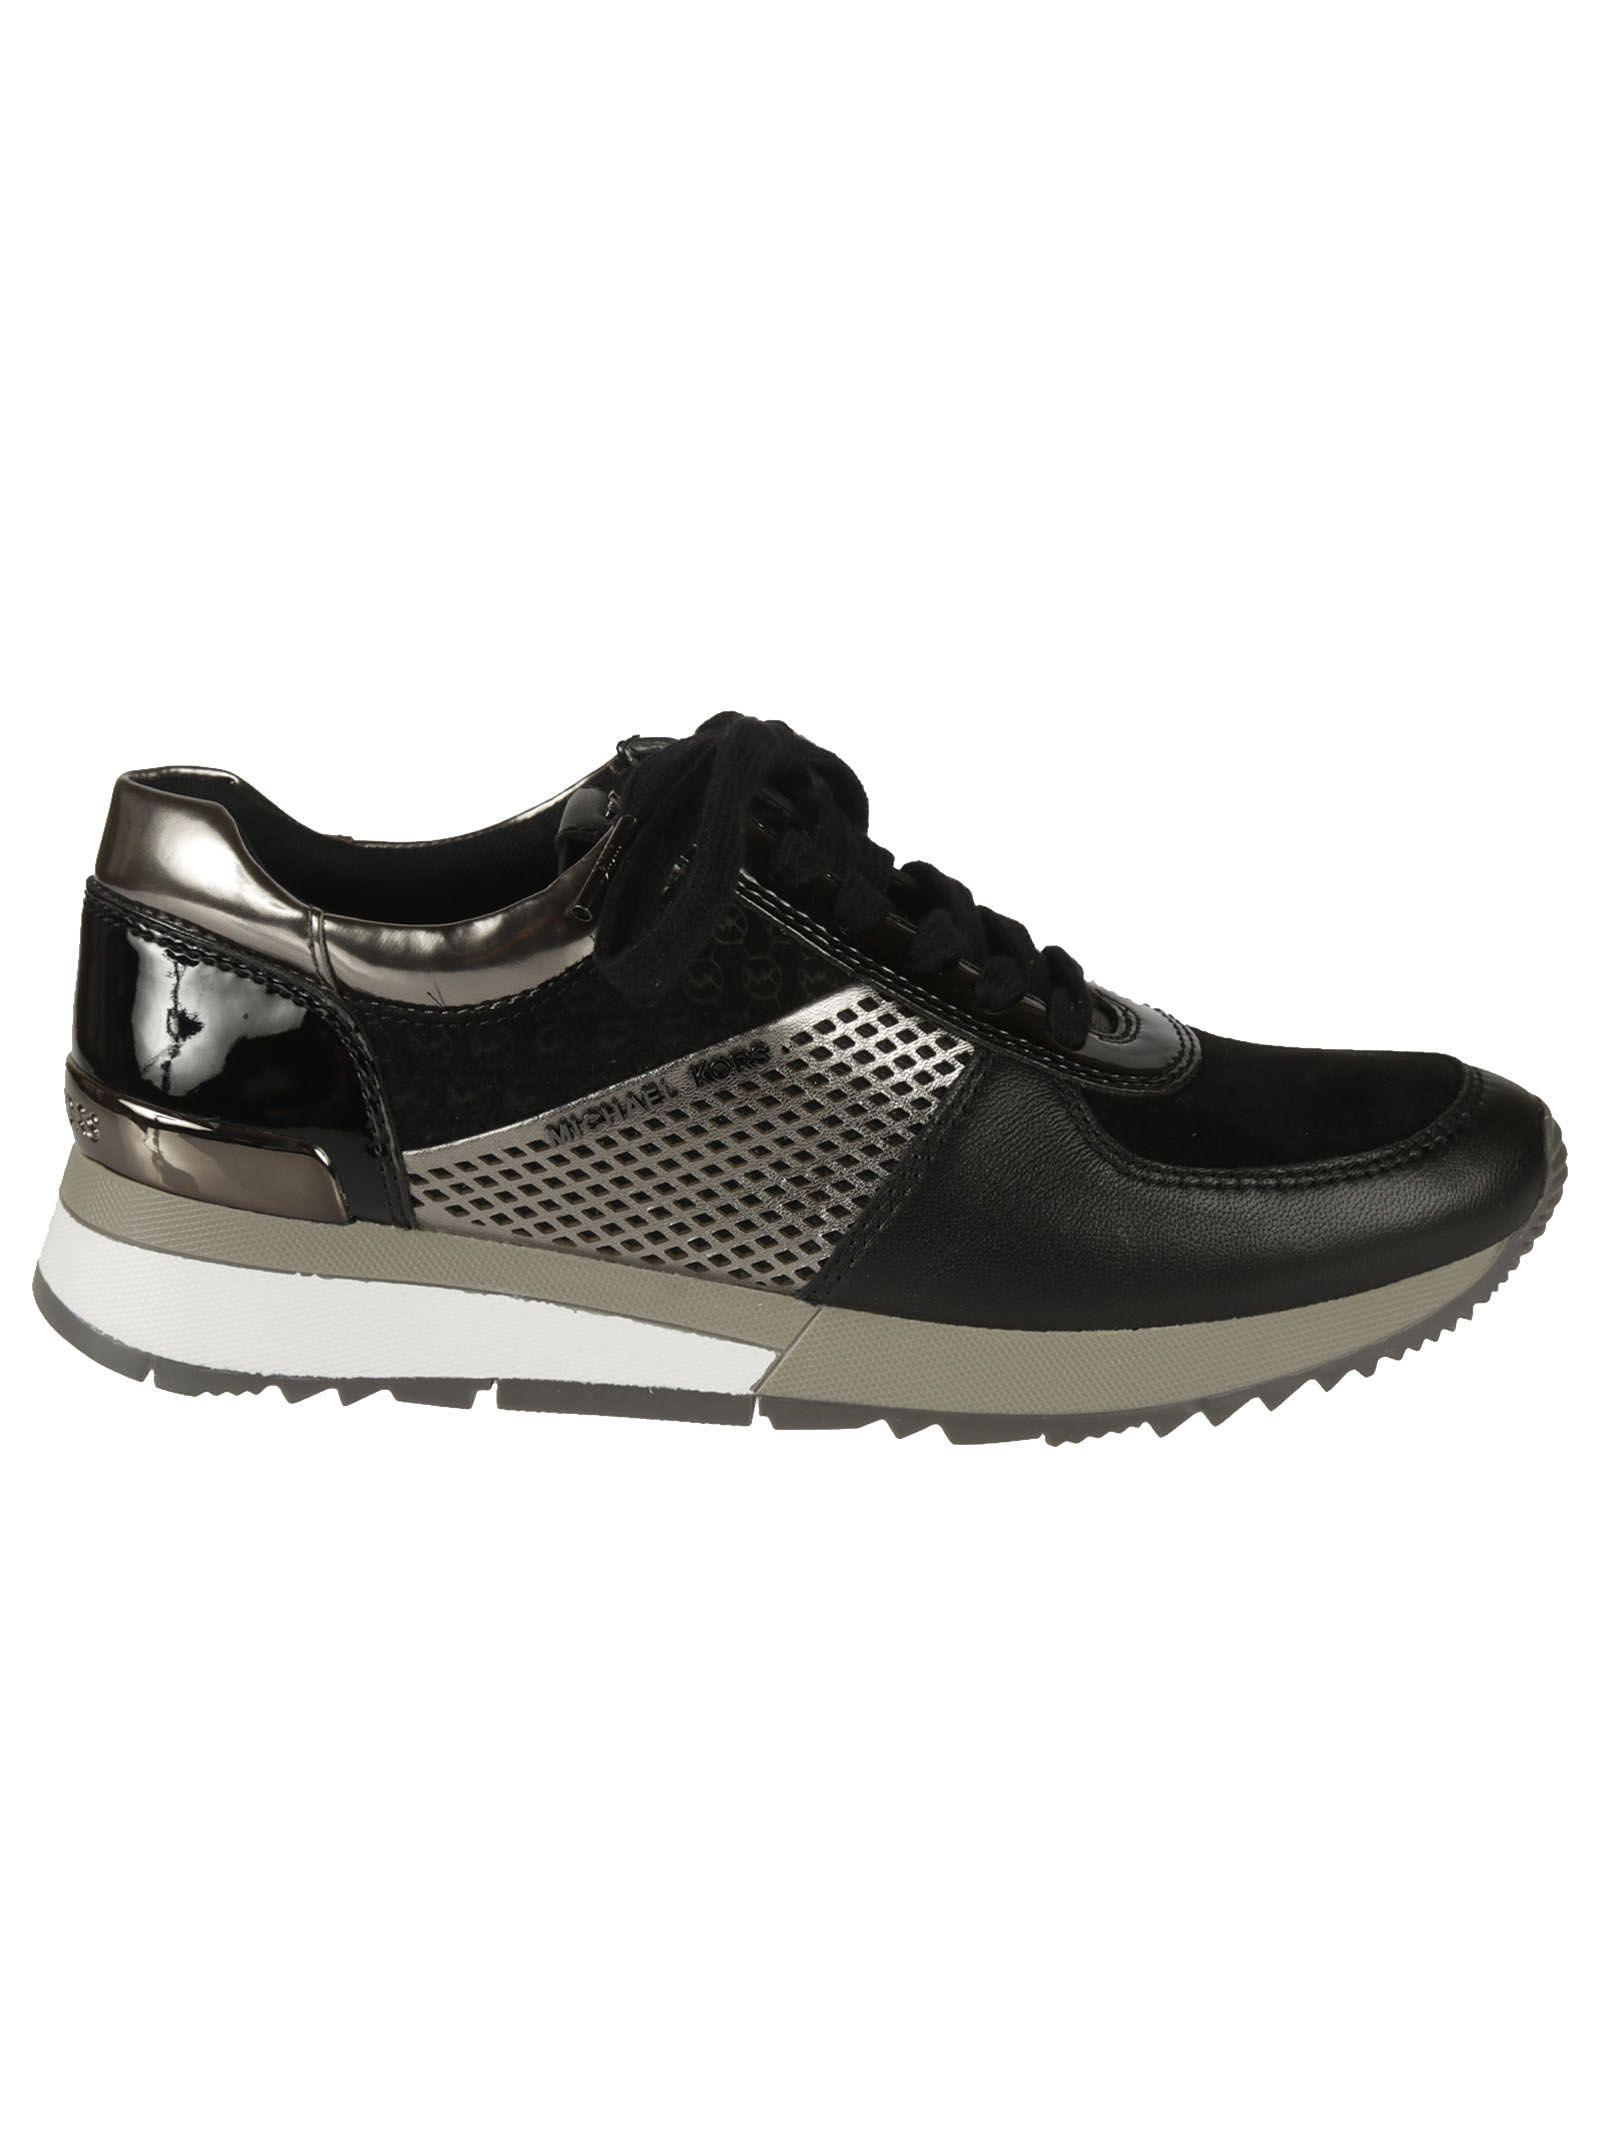 Michael Kors Allie Metallic-Trim Sneakers